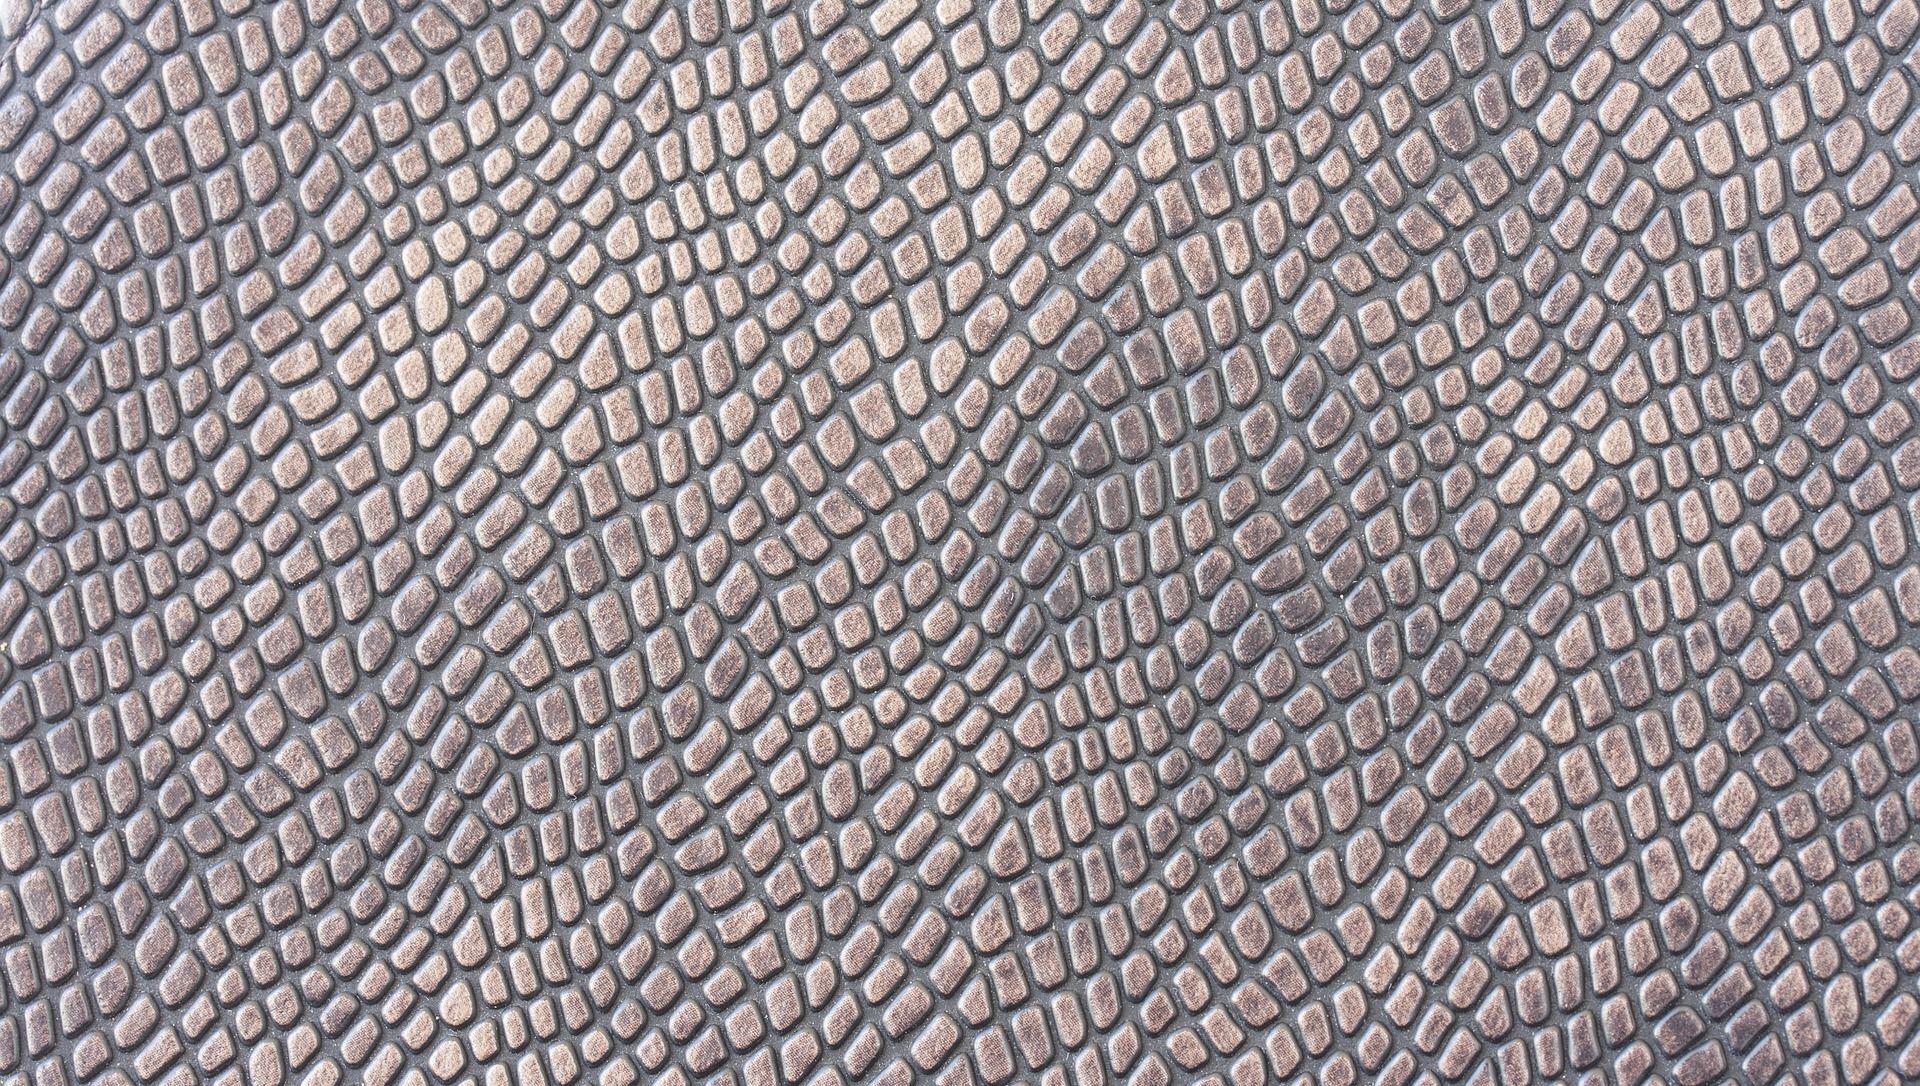 skin of an amphibian - Sputnik International, 1920, 30.07.2021